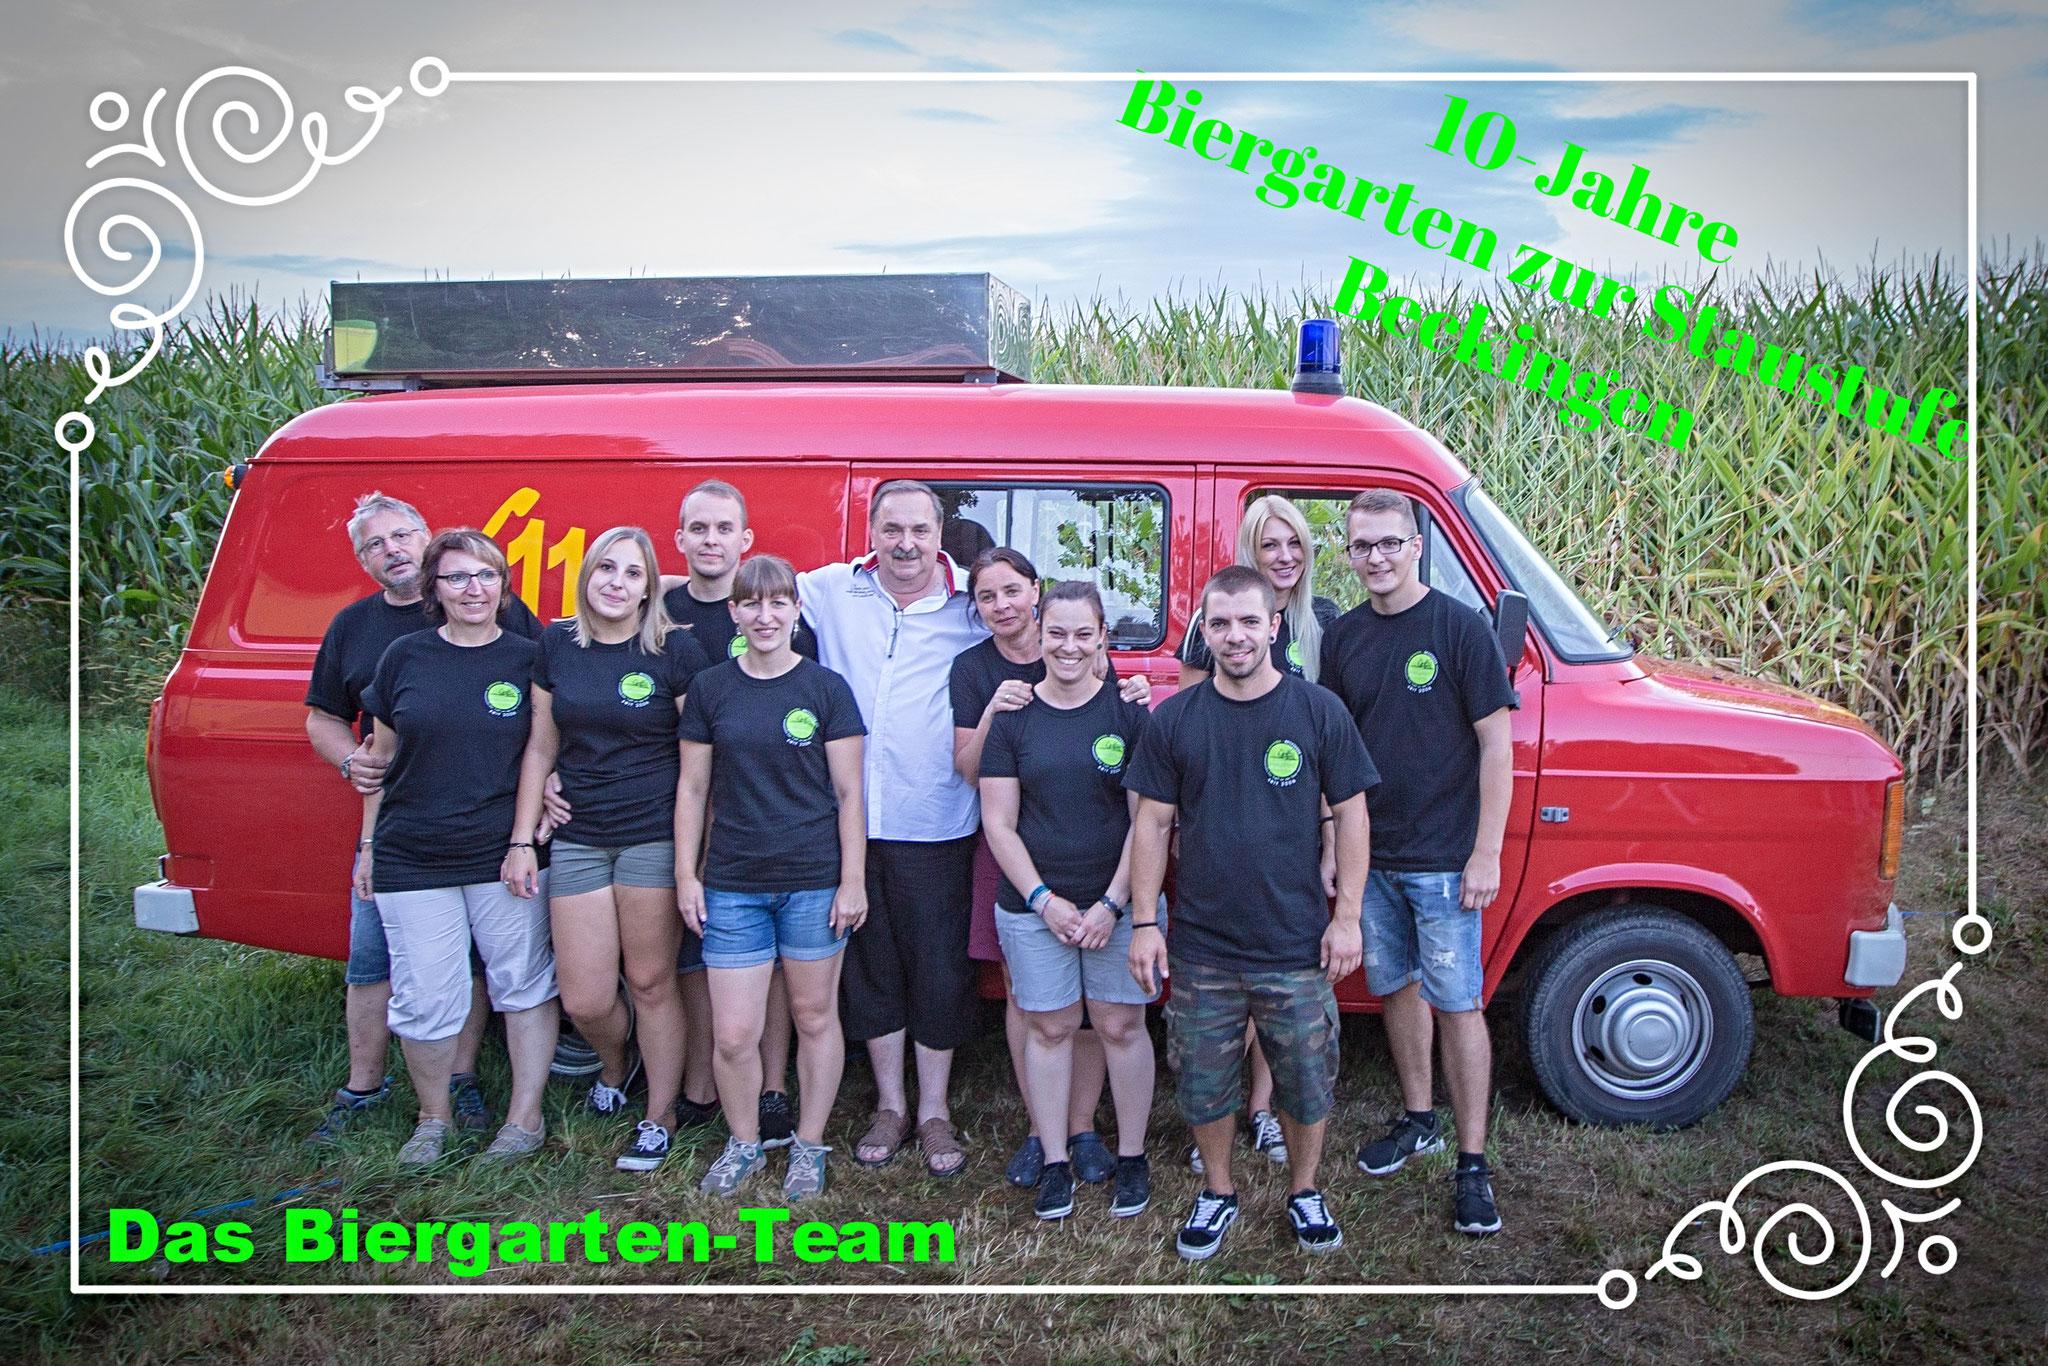 Das Biergarten-Team